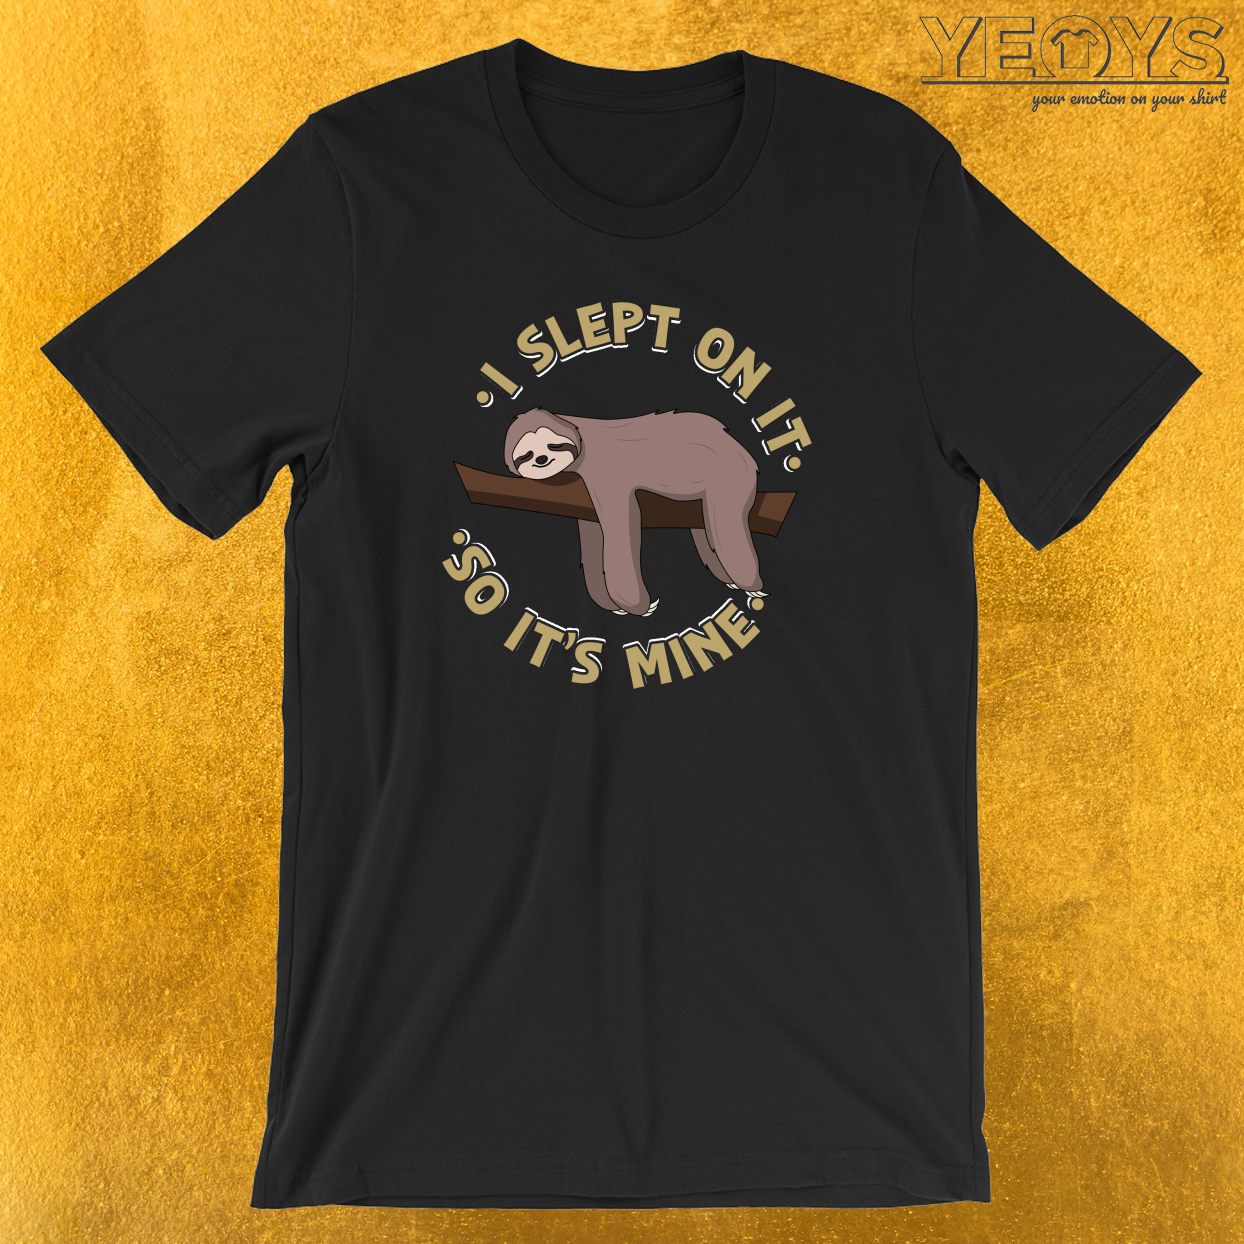 I Slept On It So It's Mine Sloth T-Shirt